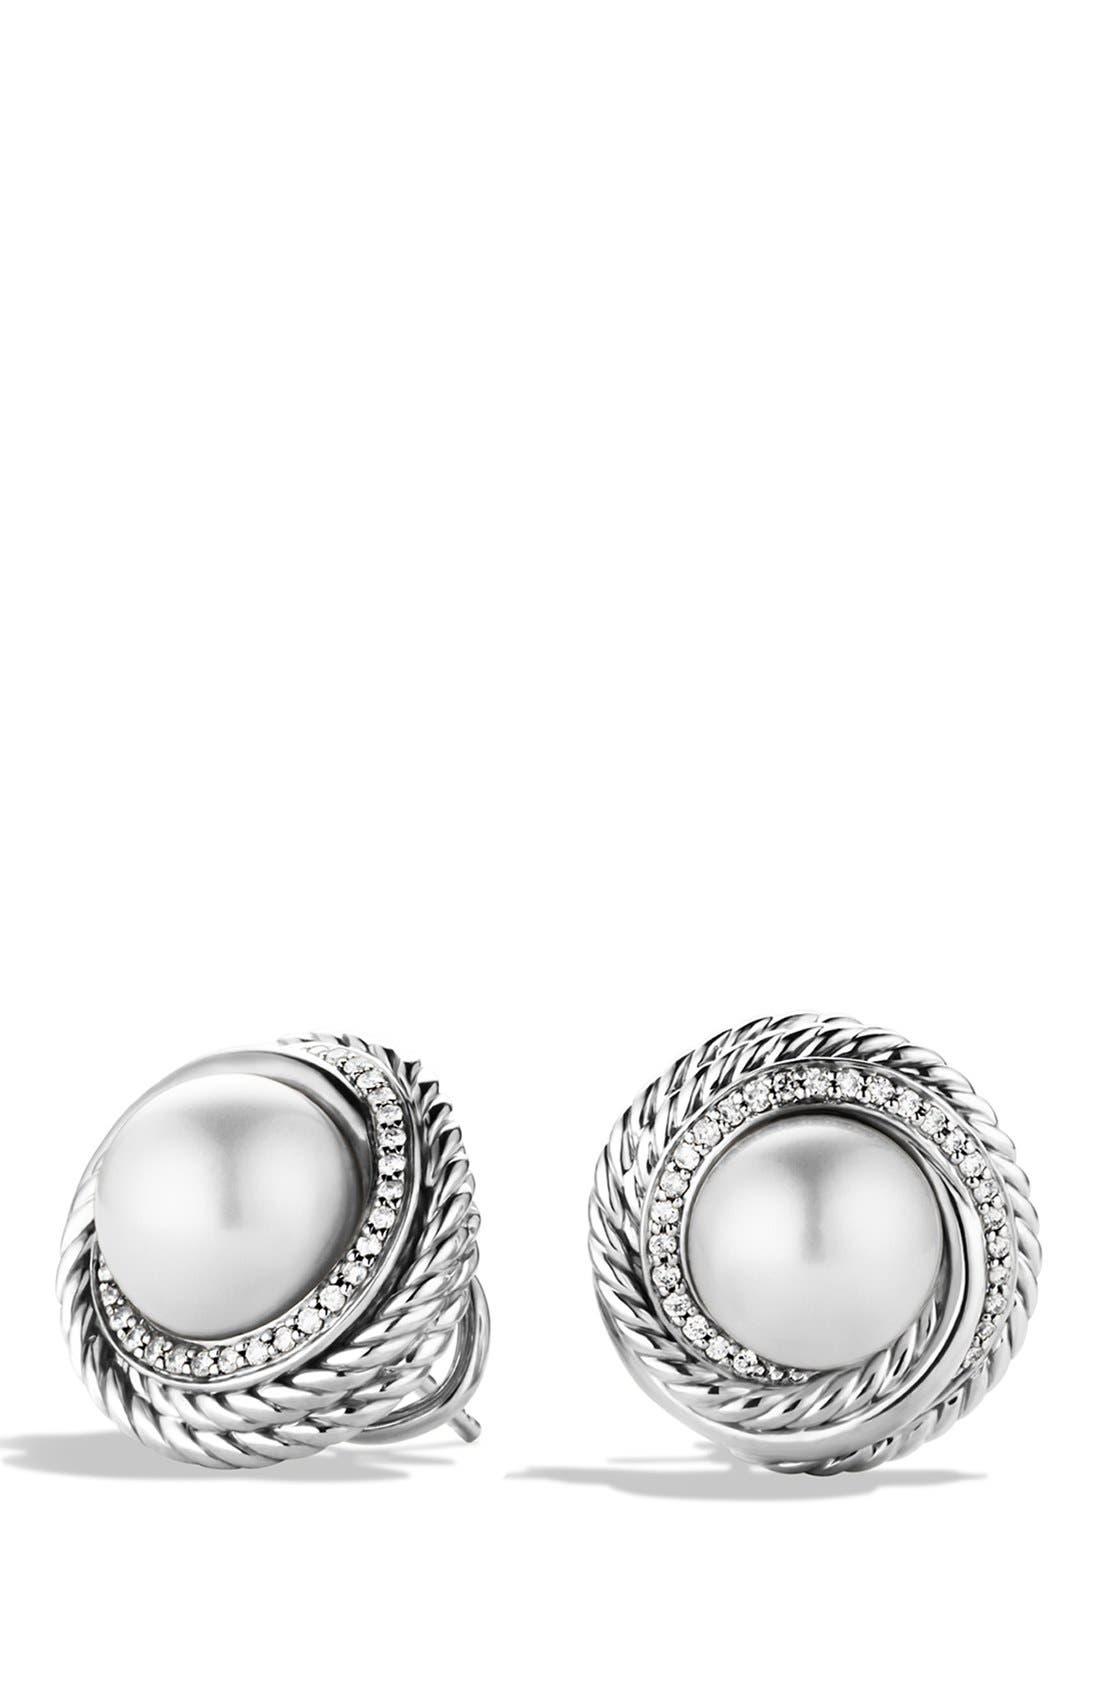 Main Image - David Yurman 'Pearl Crossover' Earrings with Diamonds